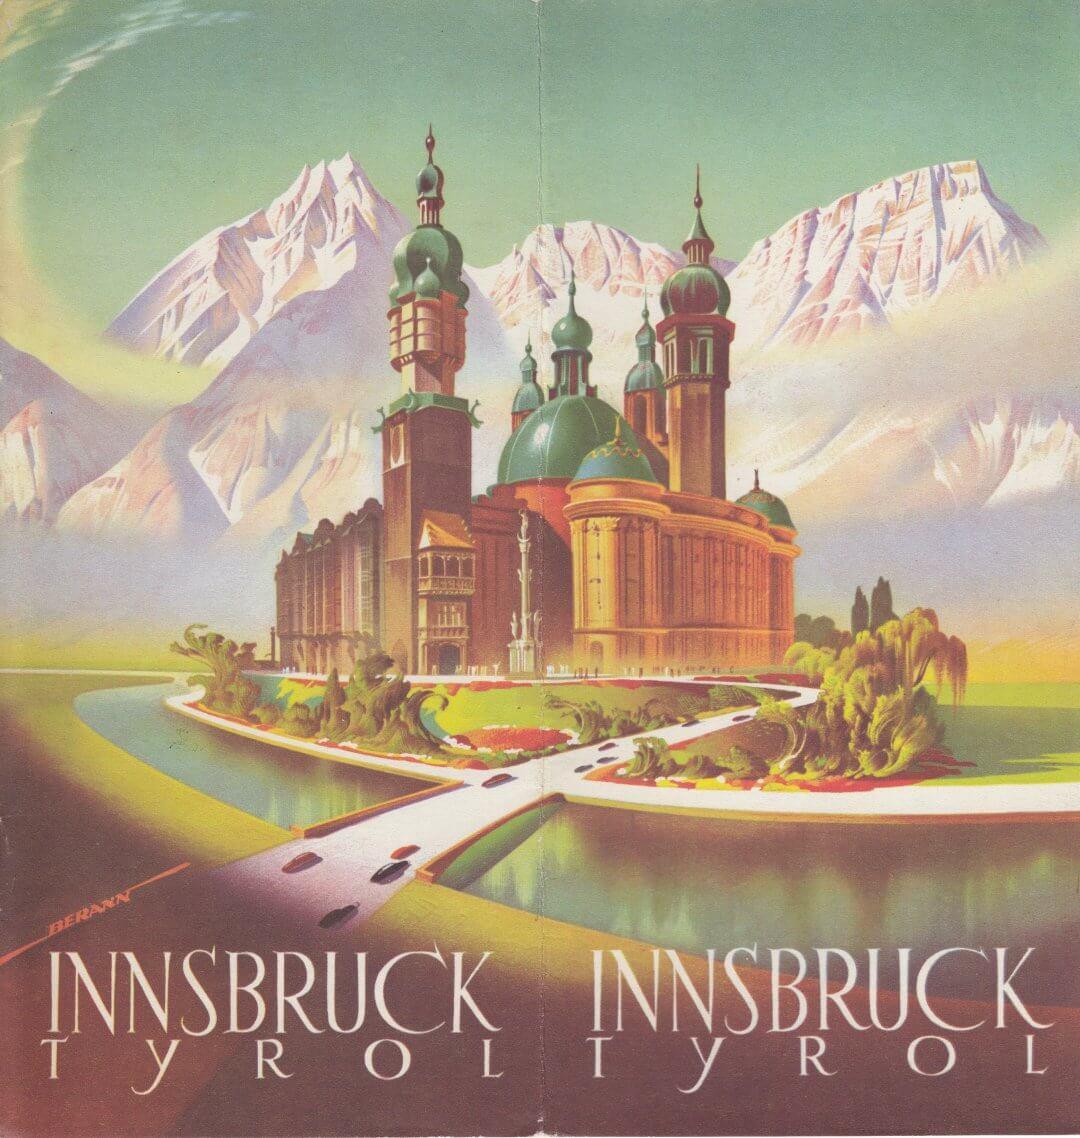 Innsbruck Tyrol